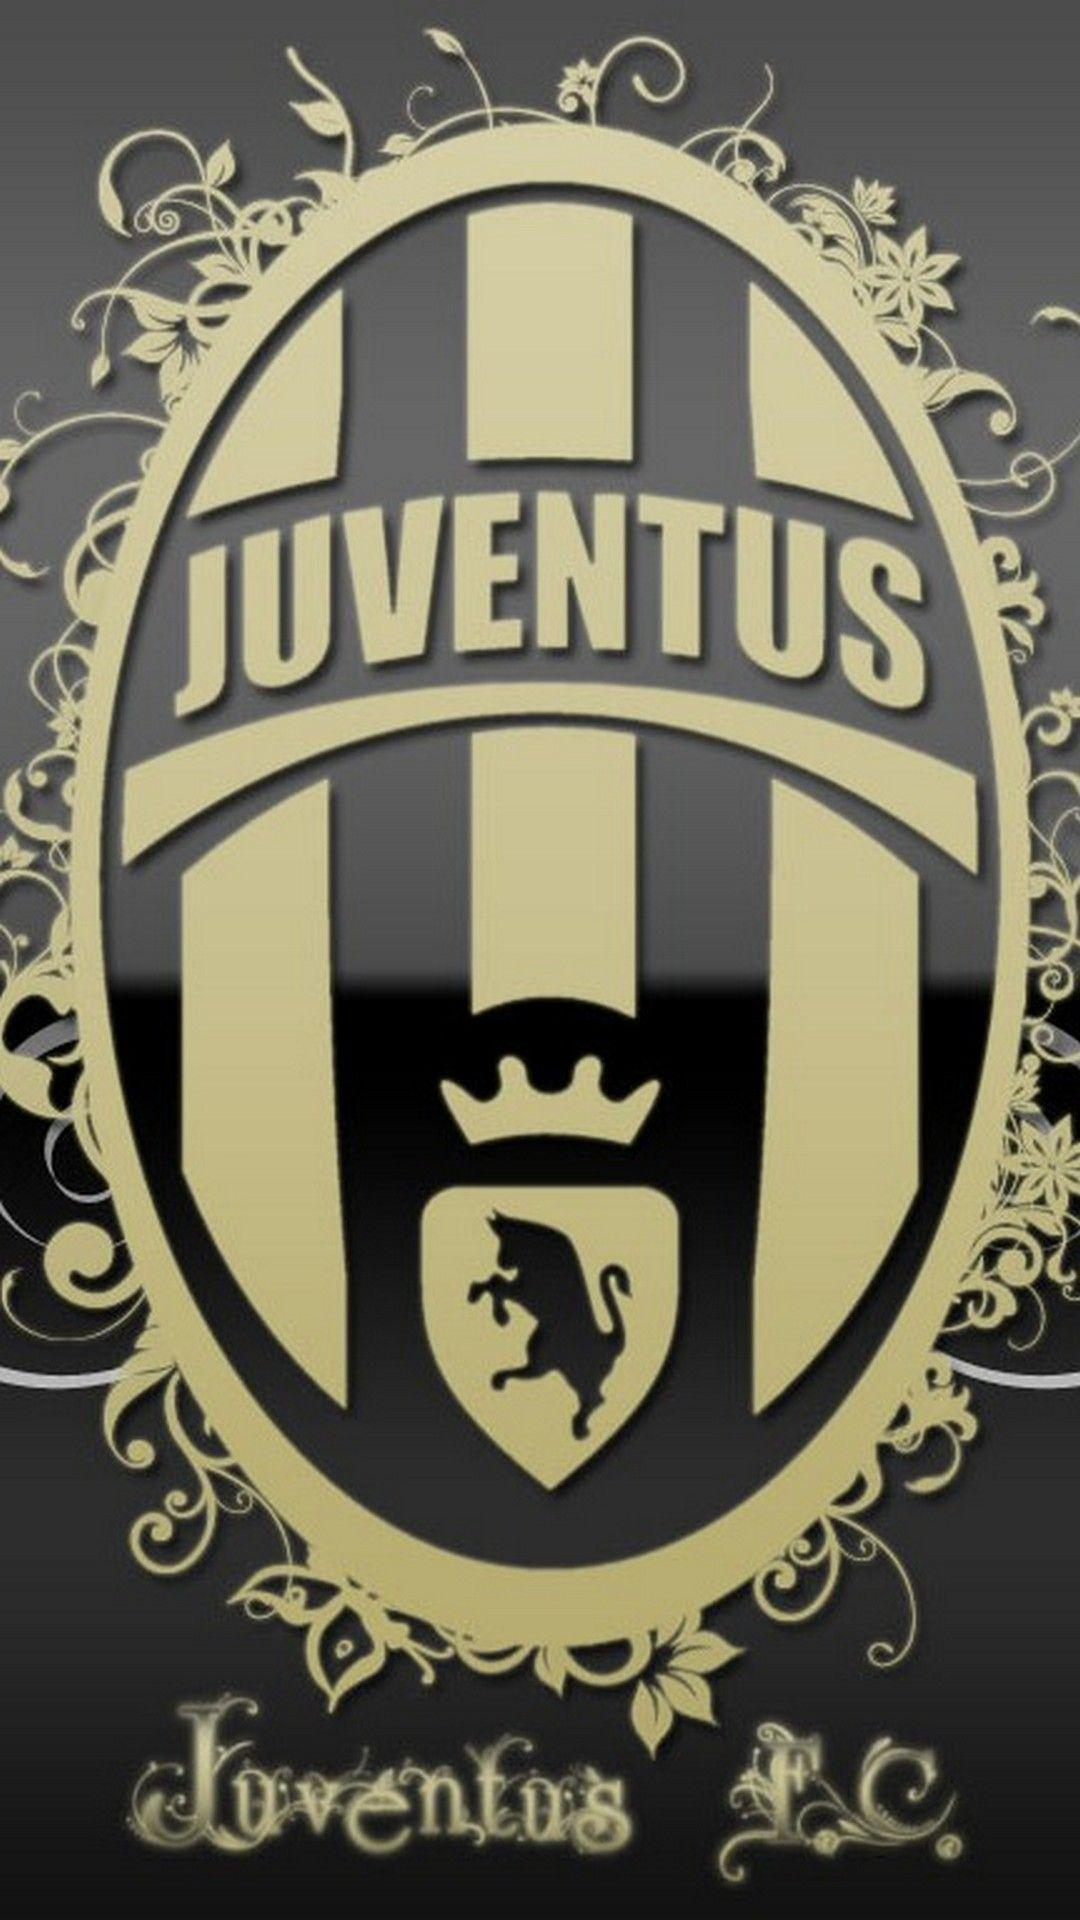 Juventus Wallpaper Android Hd